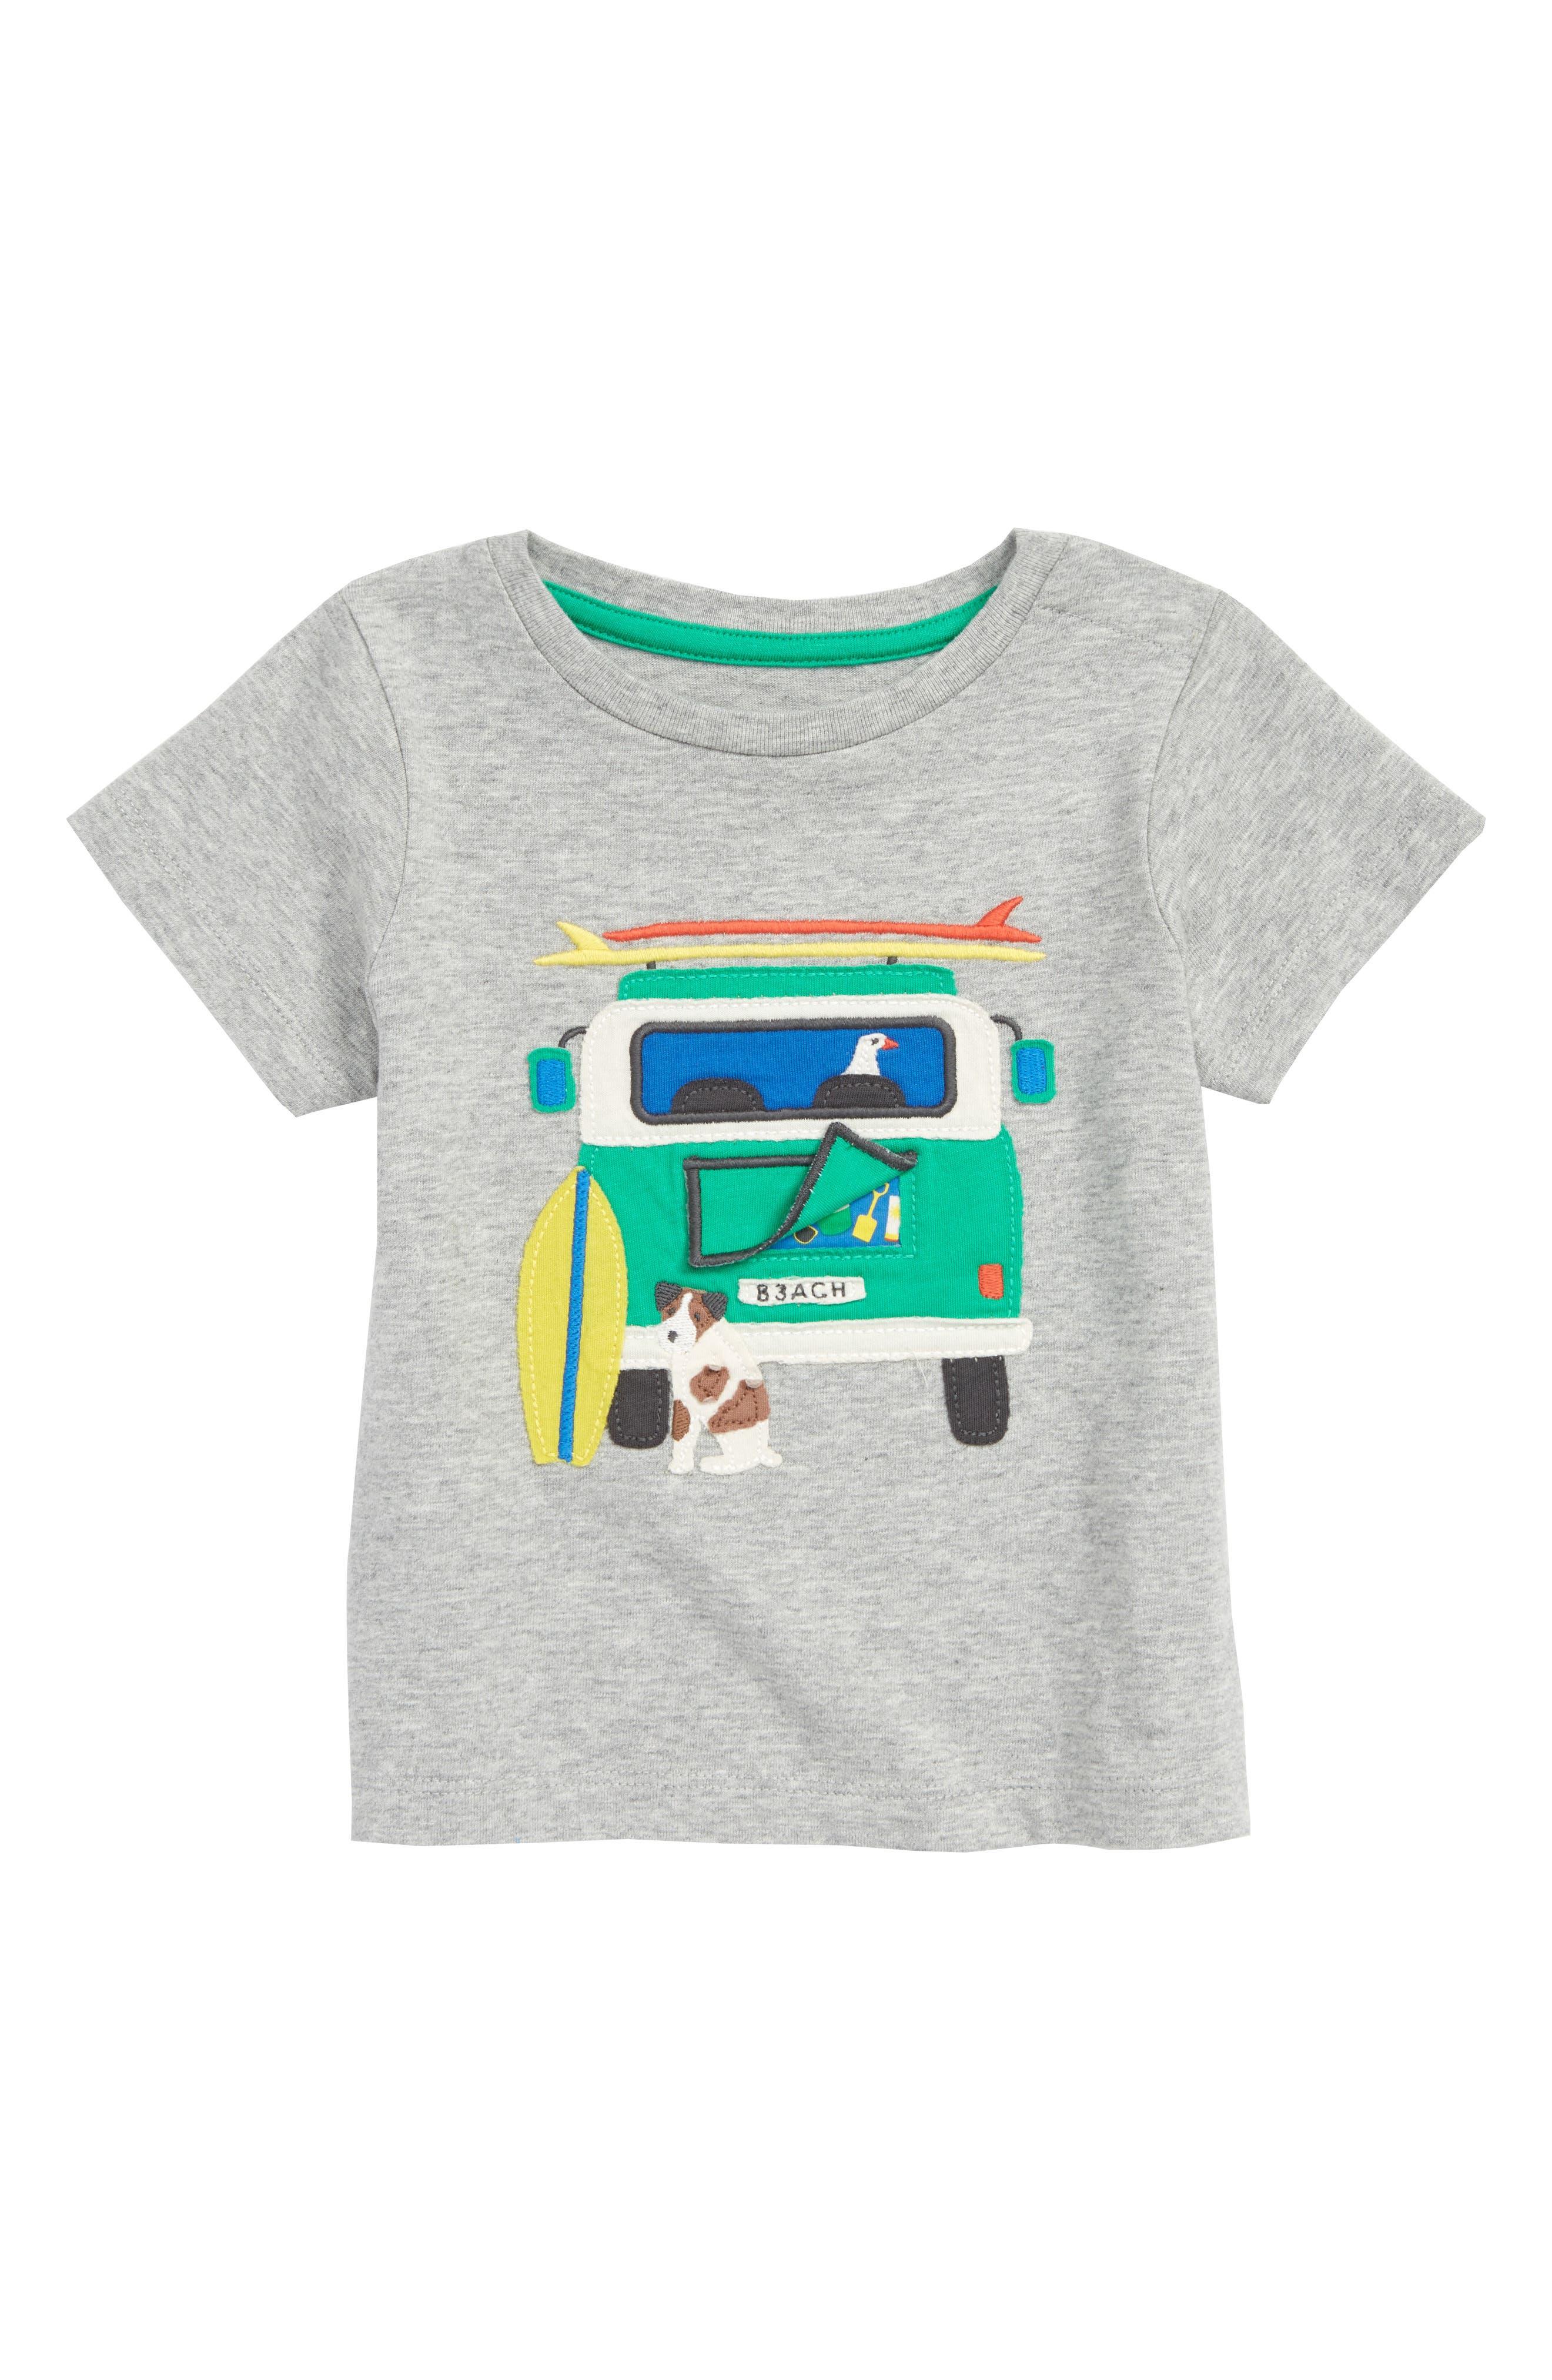 Peekaboo T-Shirt,                         Main,                         color, Grey Marl